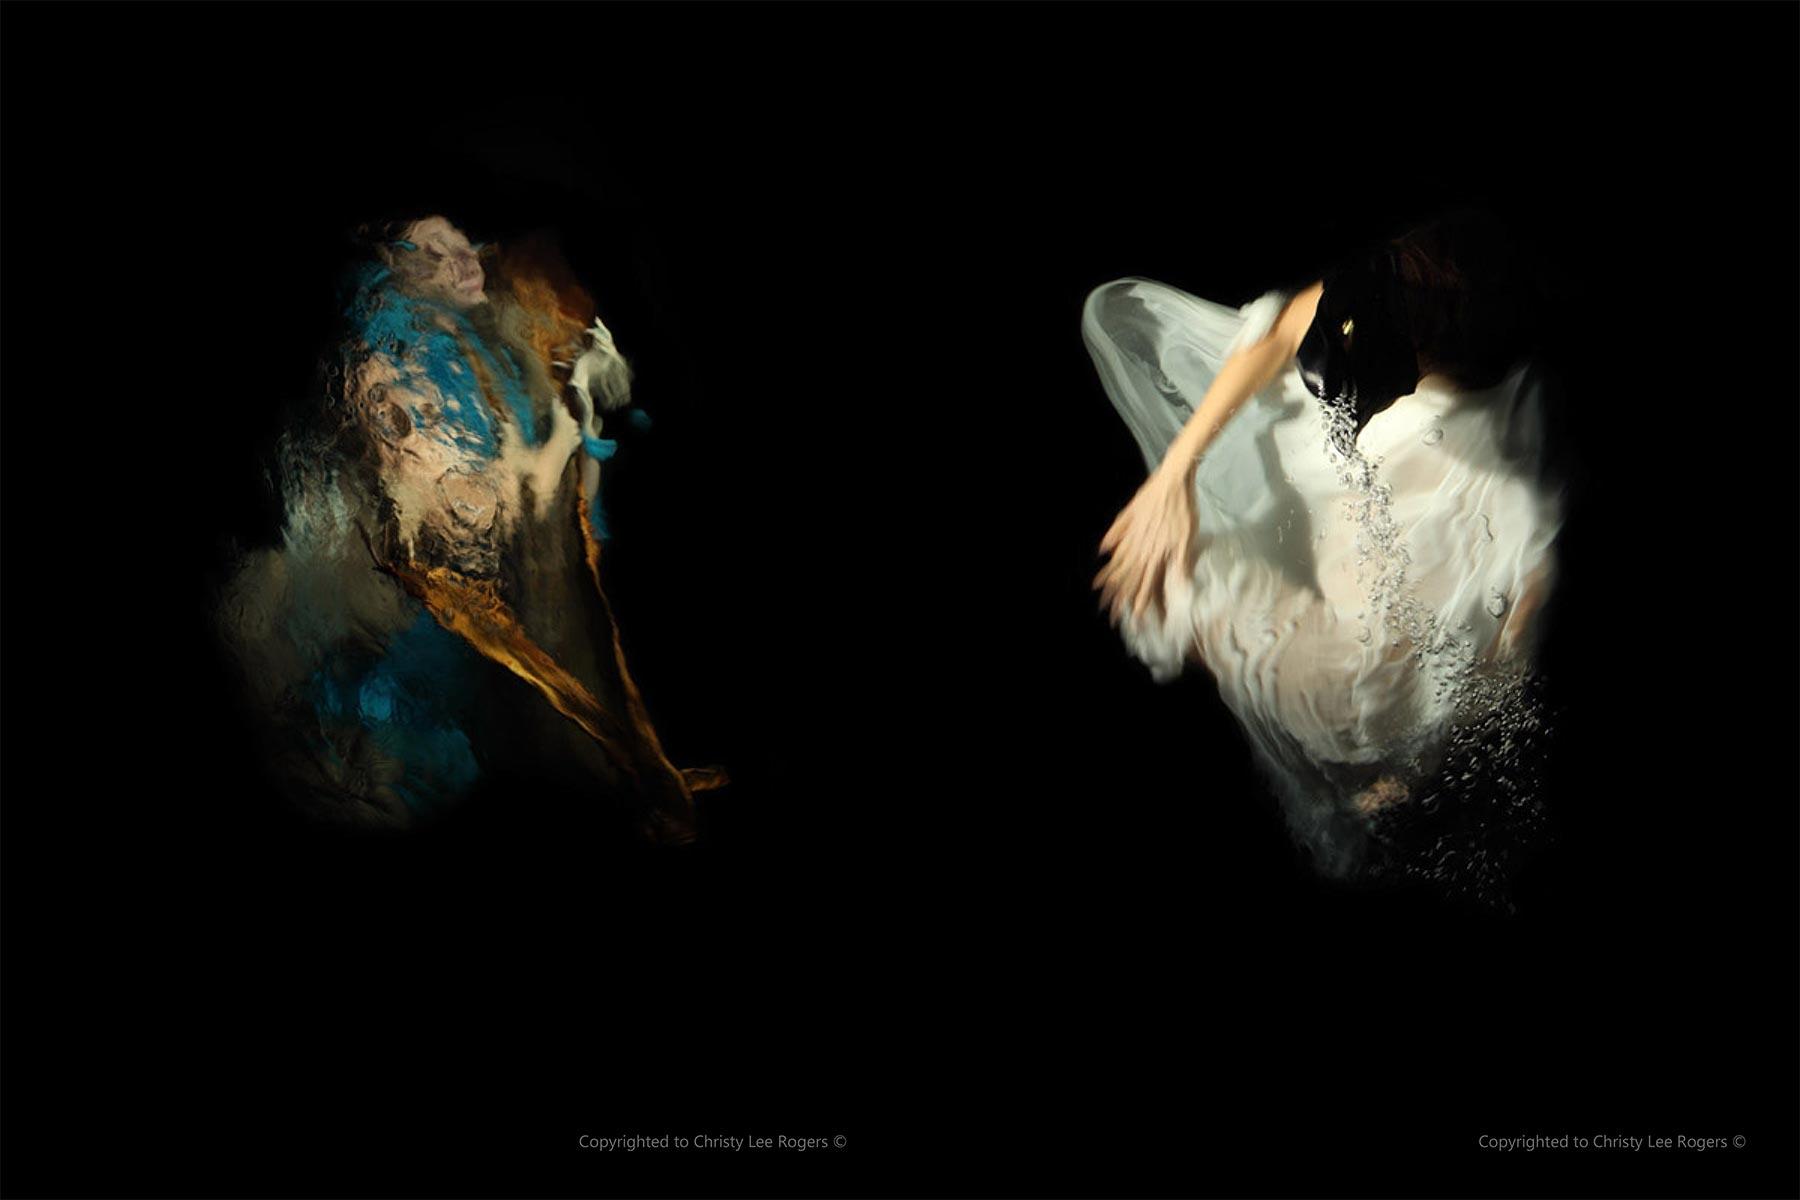 Christy_ArtMarket_Issue20-3.jpg